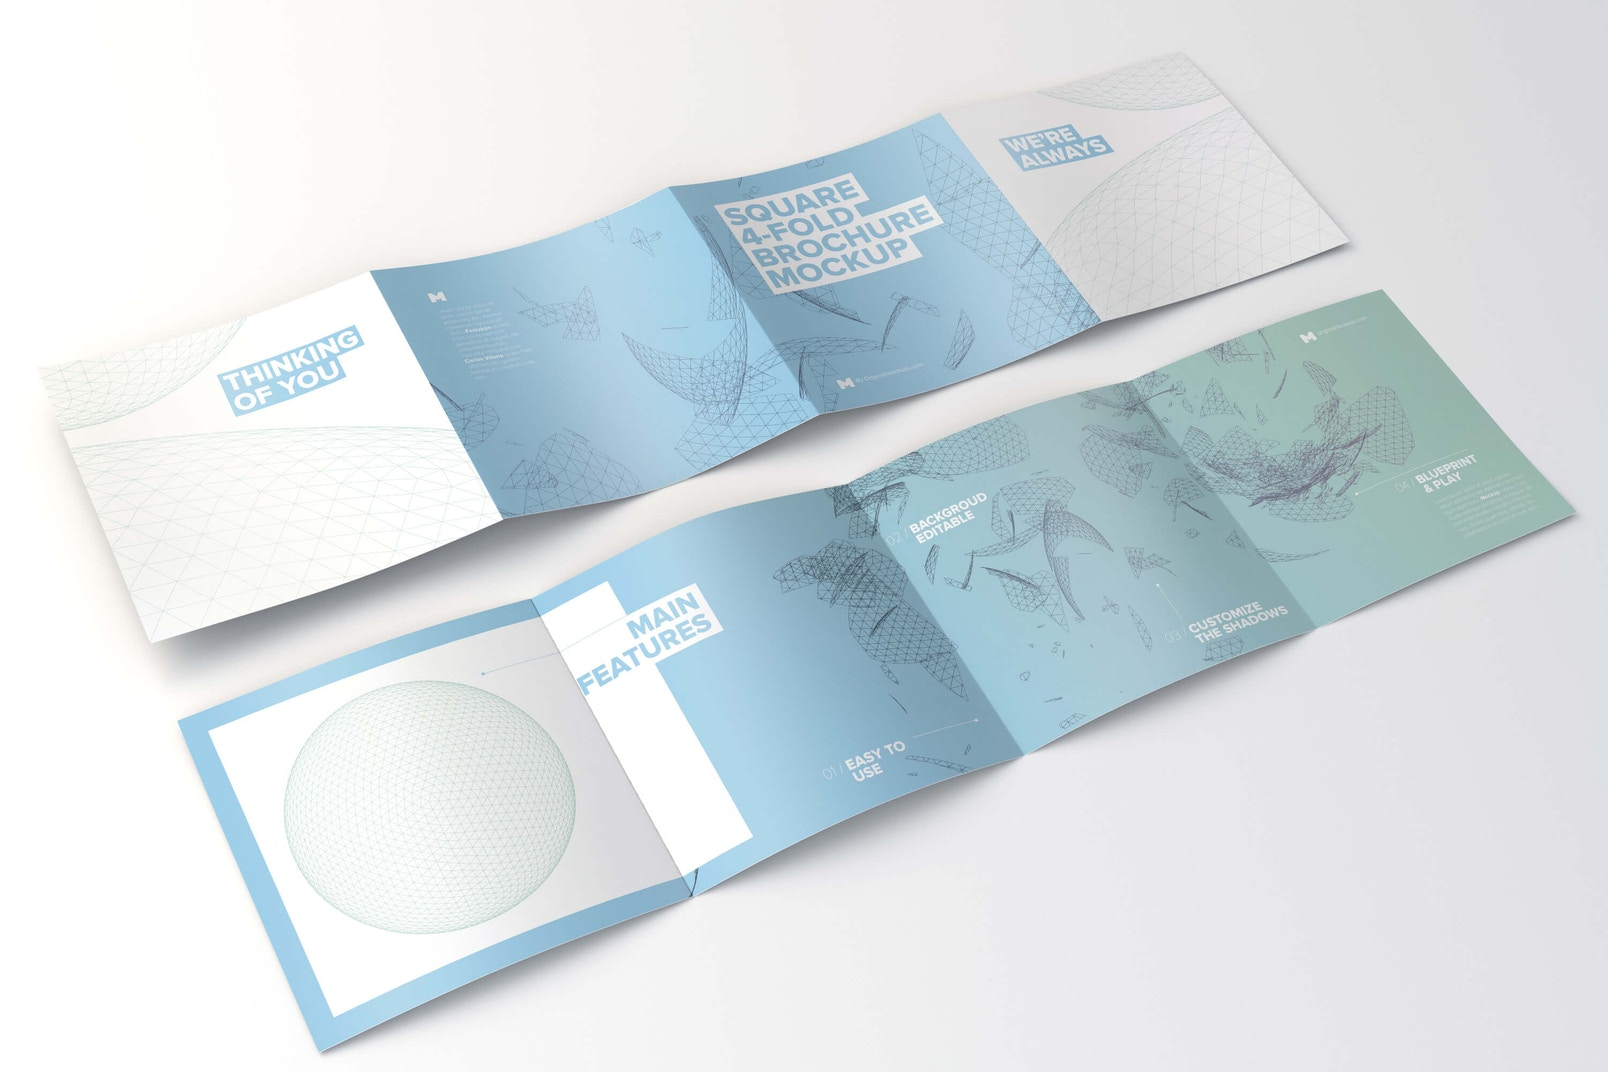 Spread Square 4-Fold Brochure Outside and Inside Mockup 01